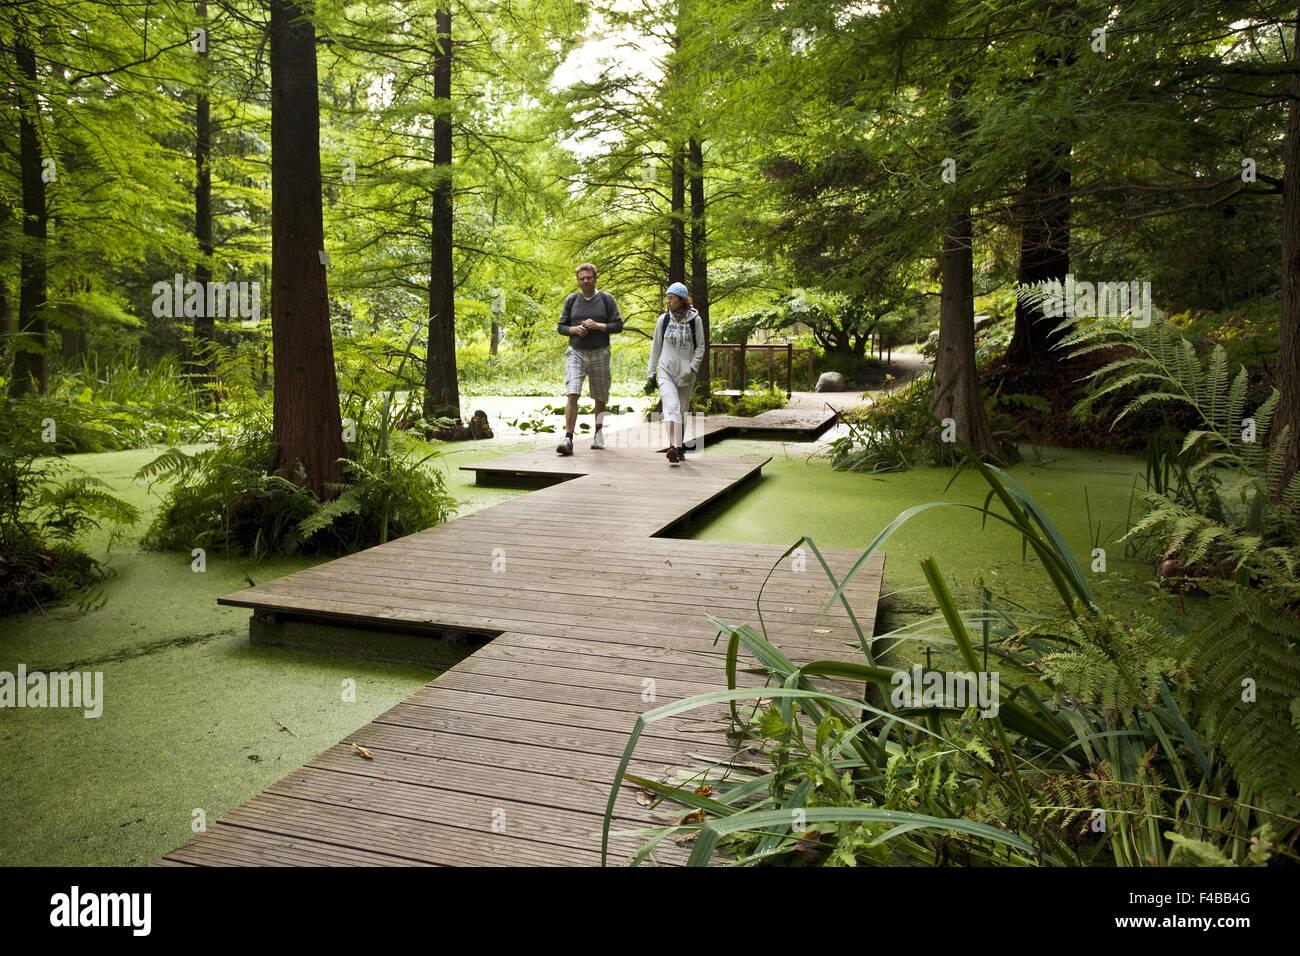 Botanischer Garten, Ruhr-Universität Bochum. Stockbild